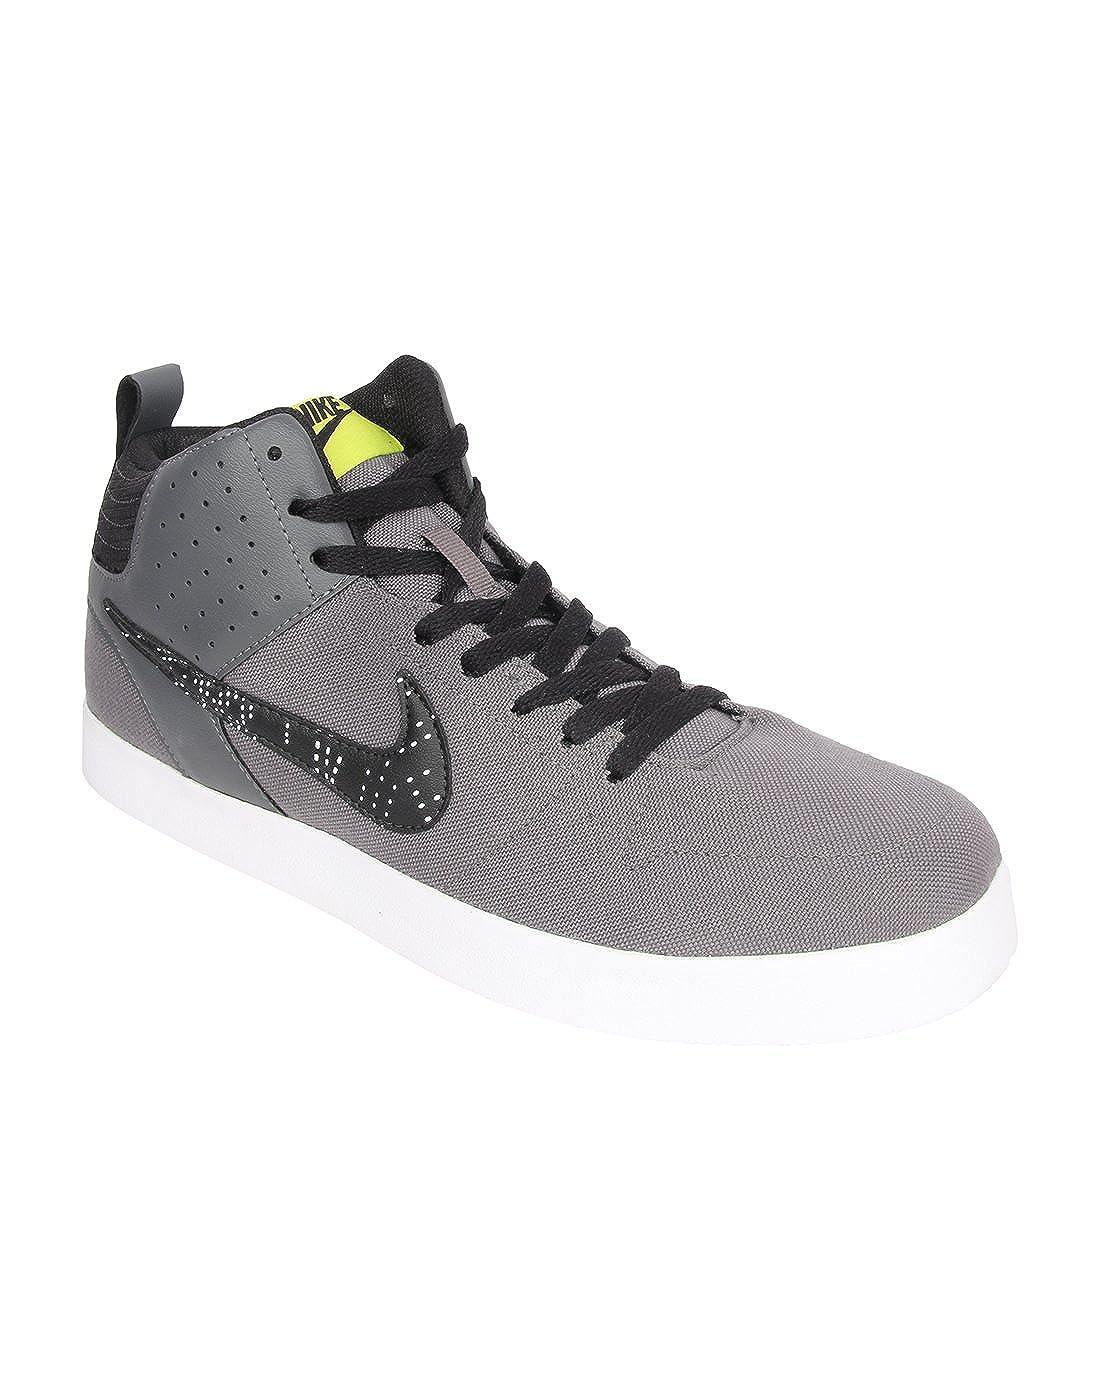 a1b345cf394 Nike Men's Canvas Casual Shoes